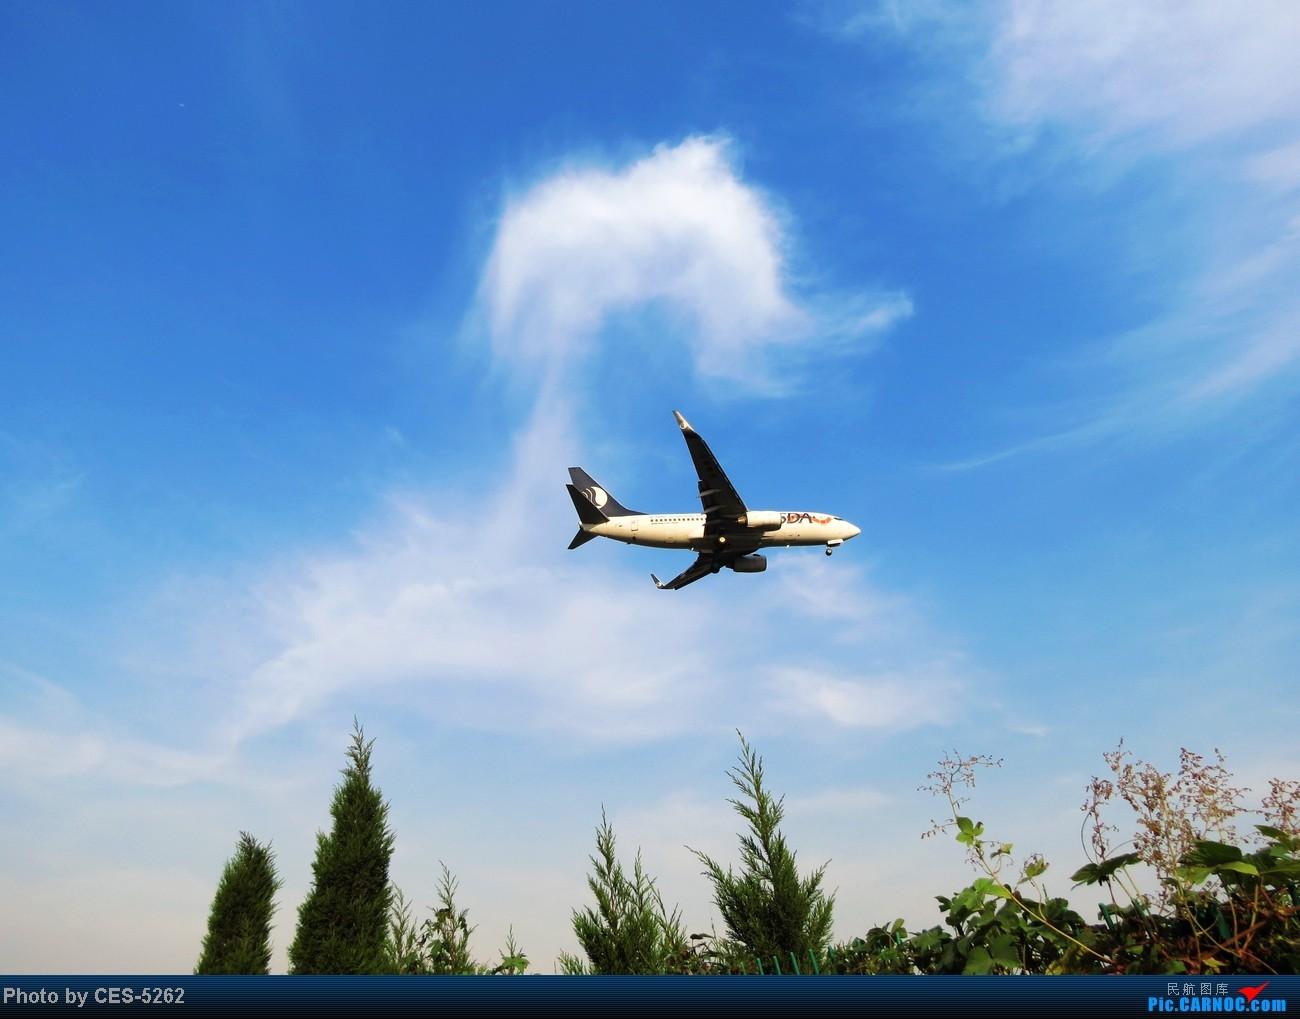 Re:[原创]国庆TAO很热闹哈,临沂飞友流窜TAO记 内有少见滴LH343 BOEING 737-700 B-5205 中国青岛流亭机场